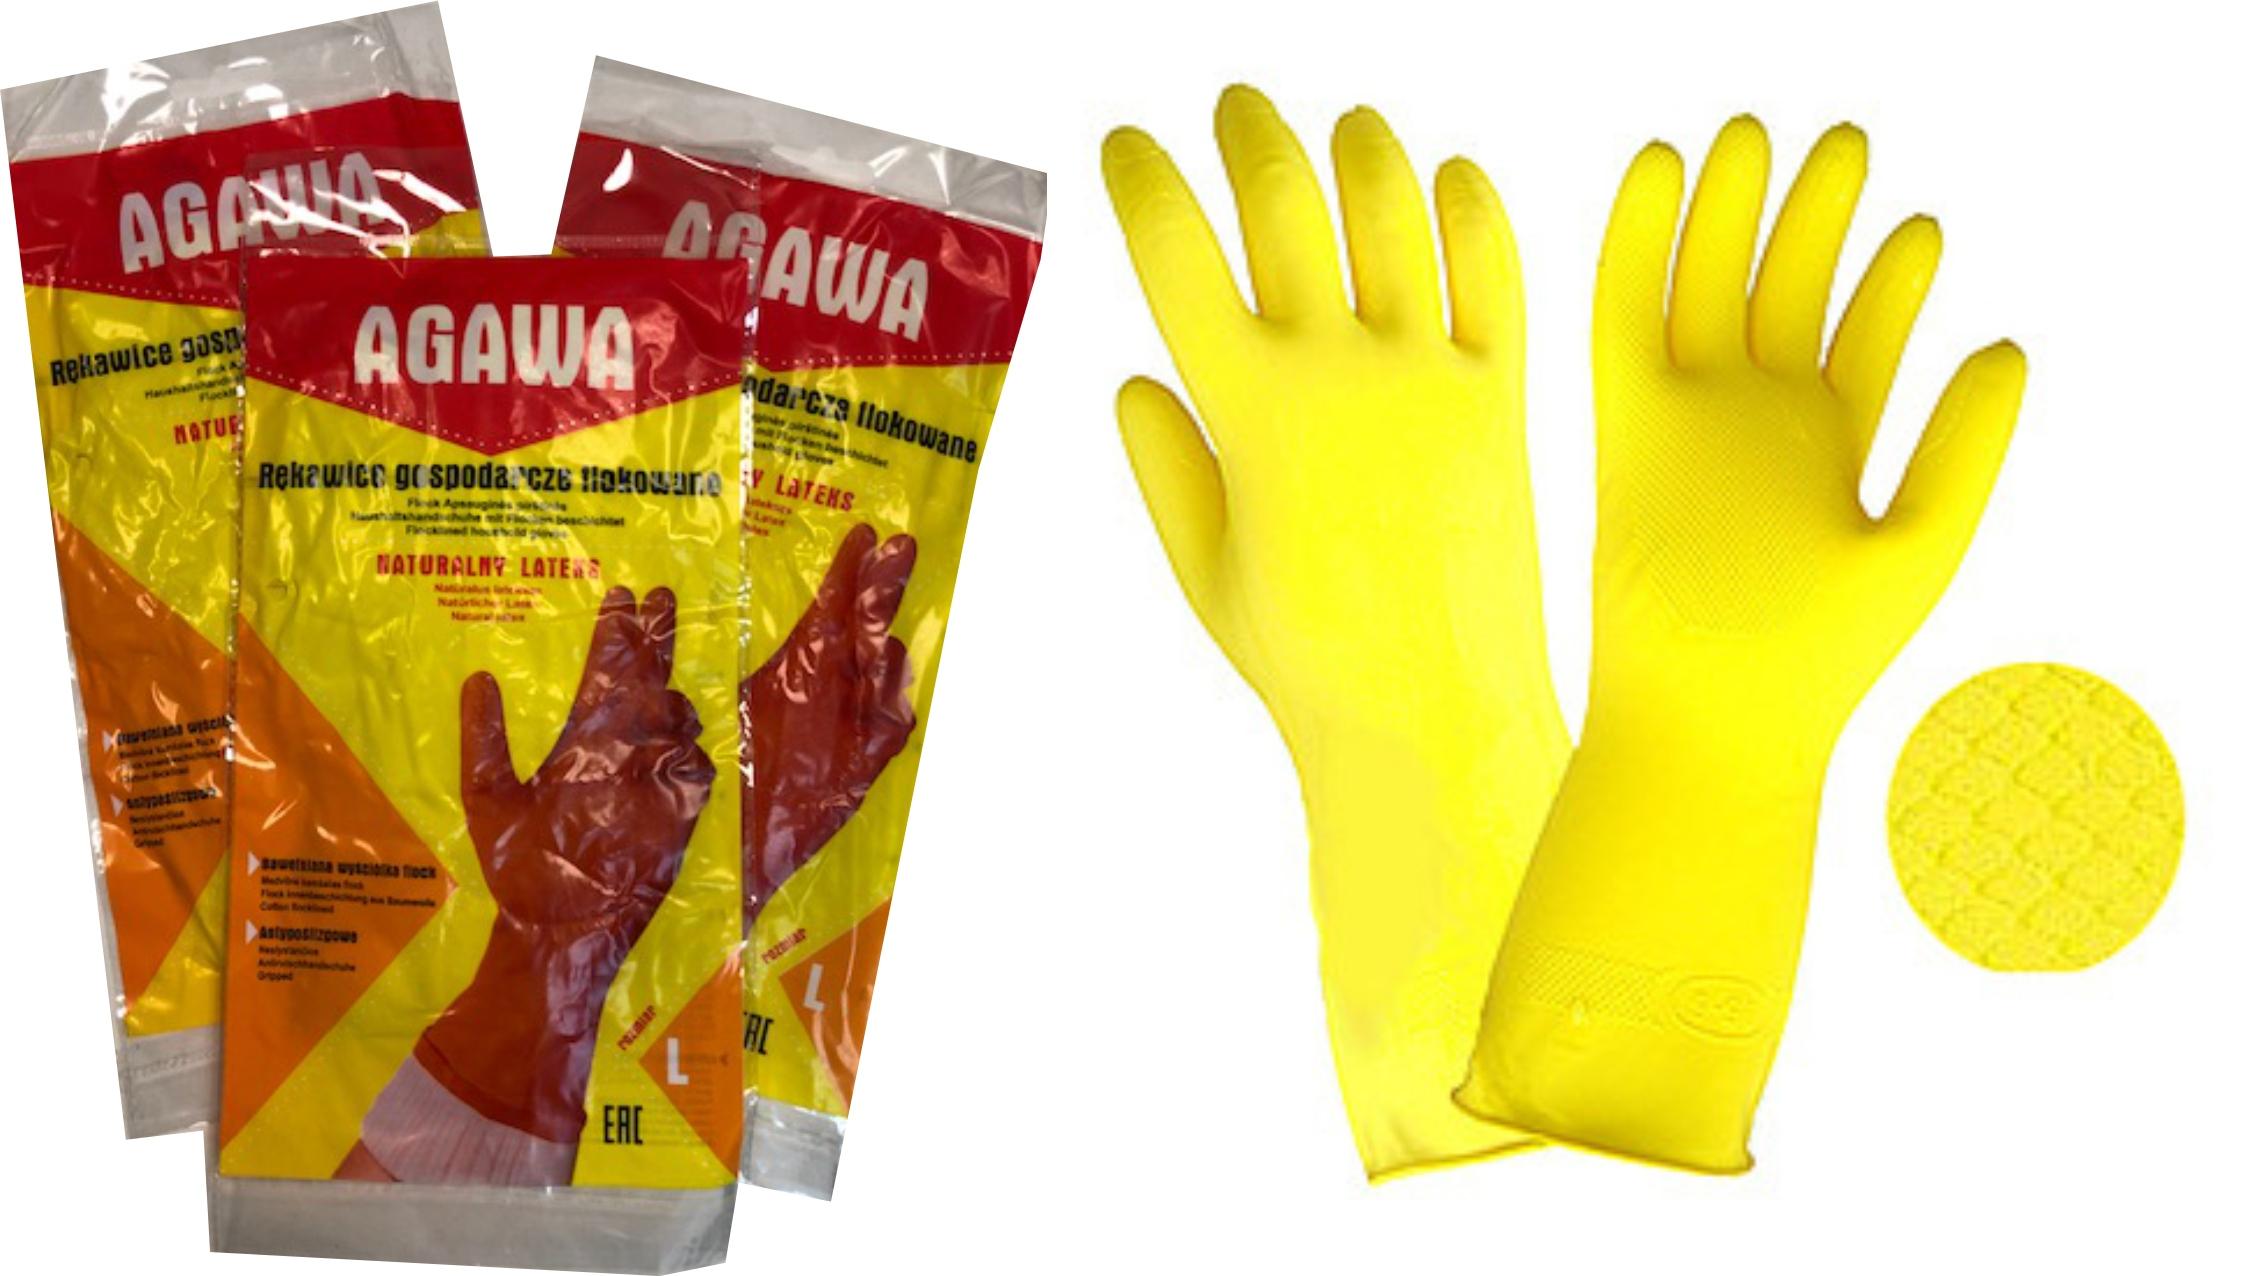 Rękawice Gospodarcze flokowane Naturalny Lateks L